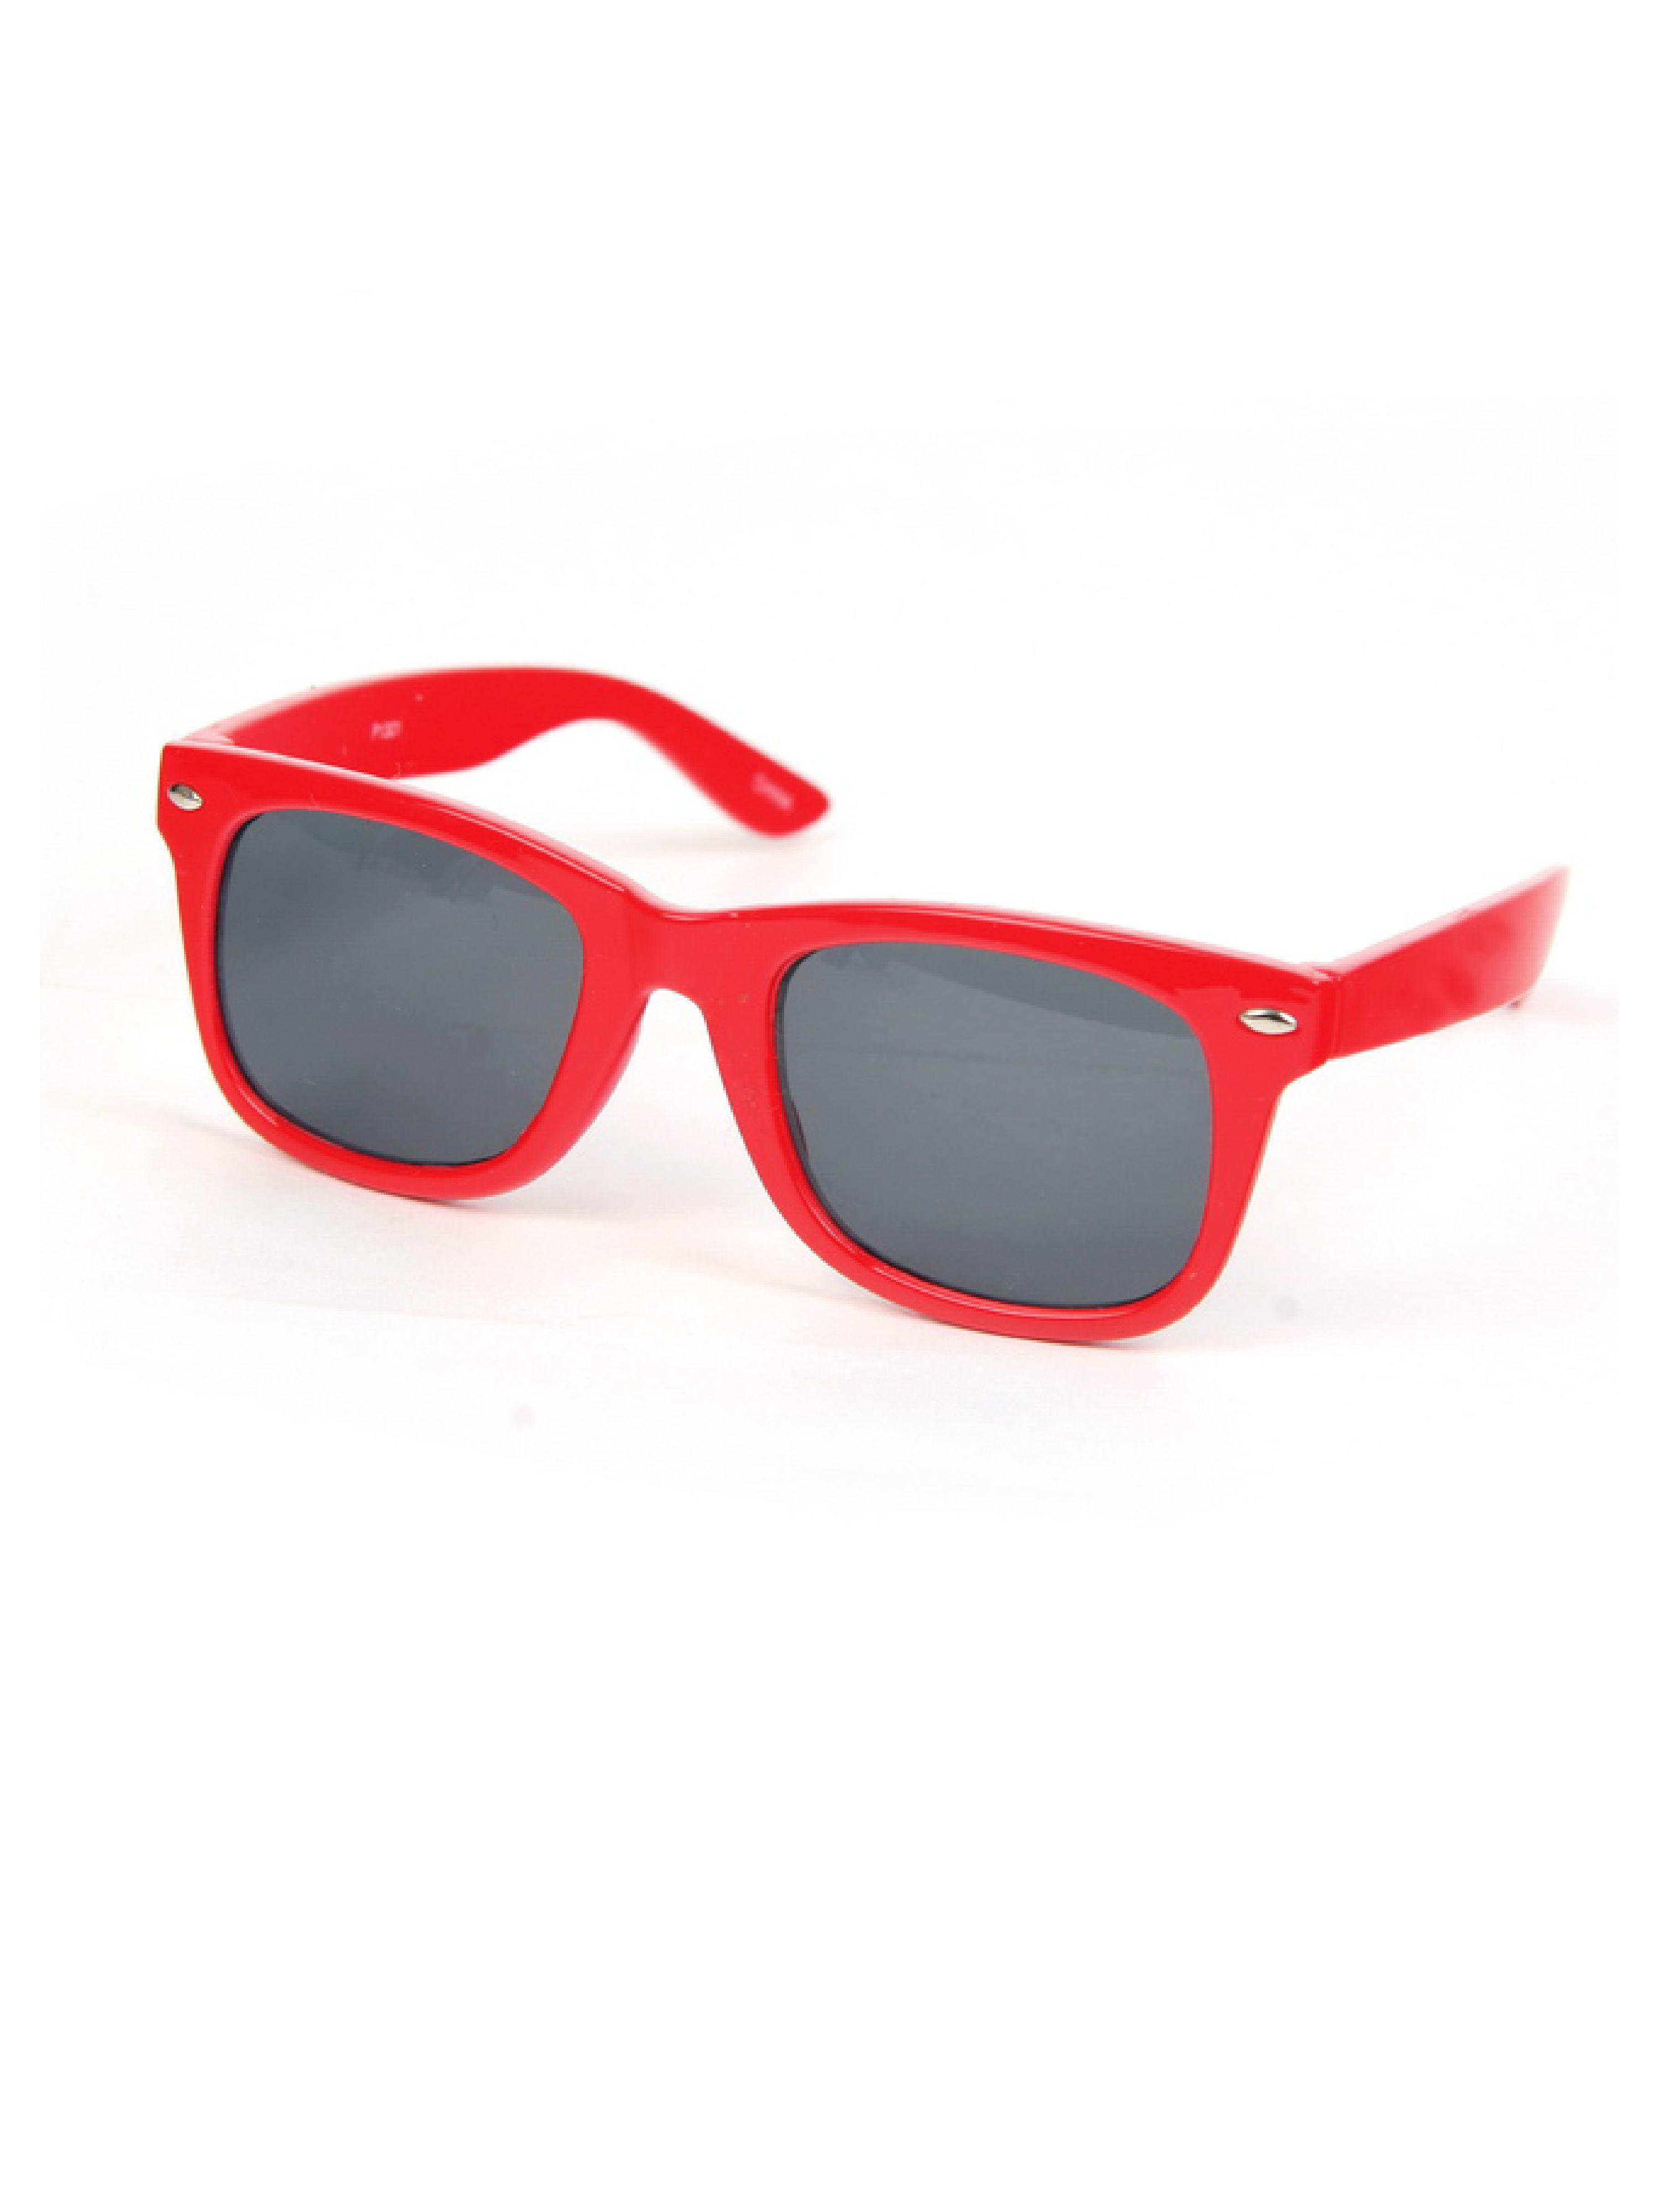 Children's Wayfarer Sunglasses P1301